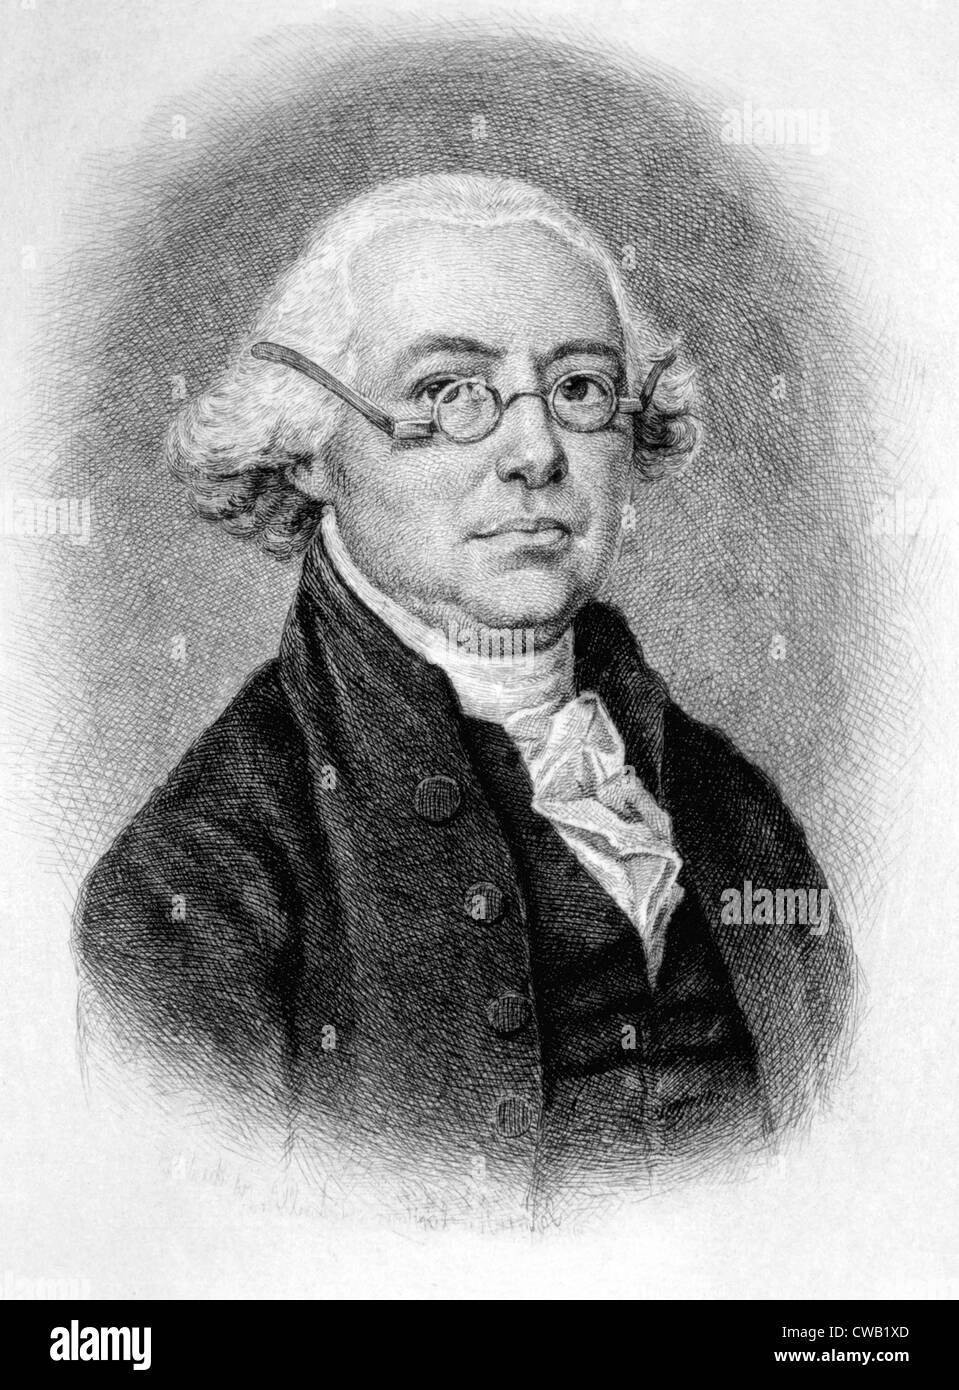 James Wilson (1742-1798), engraving 1889 - Stock Image